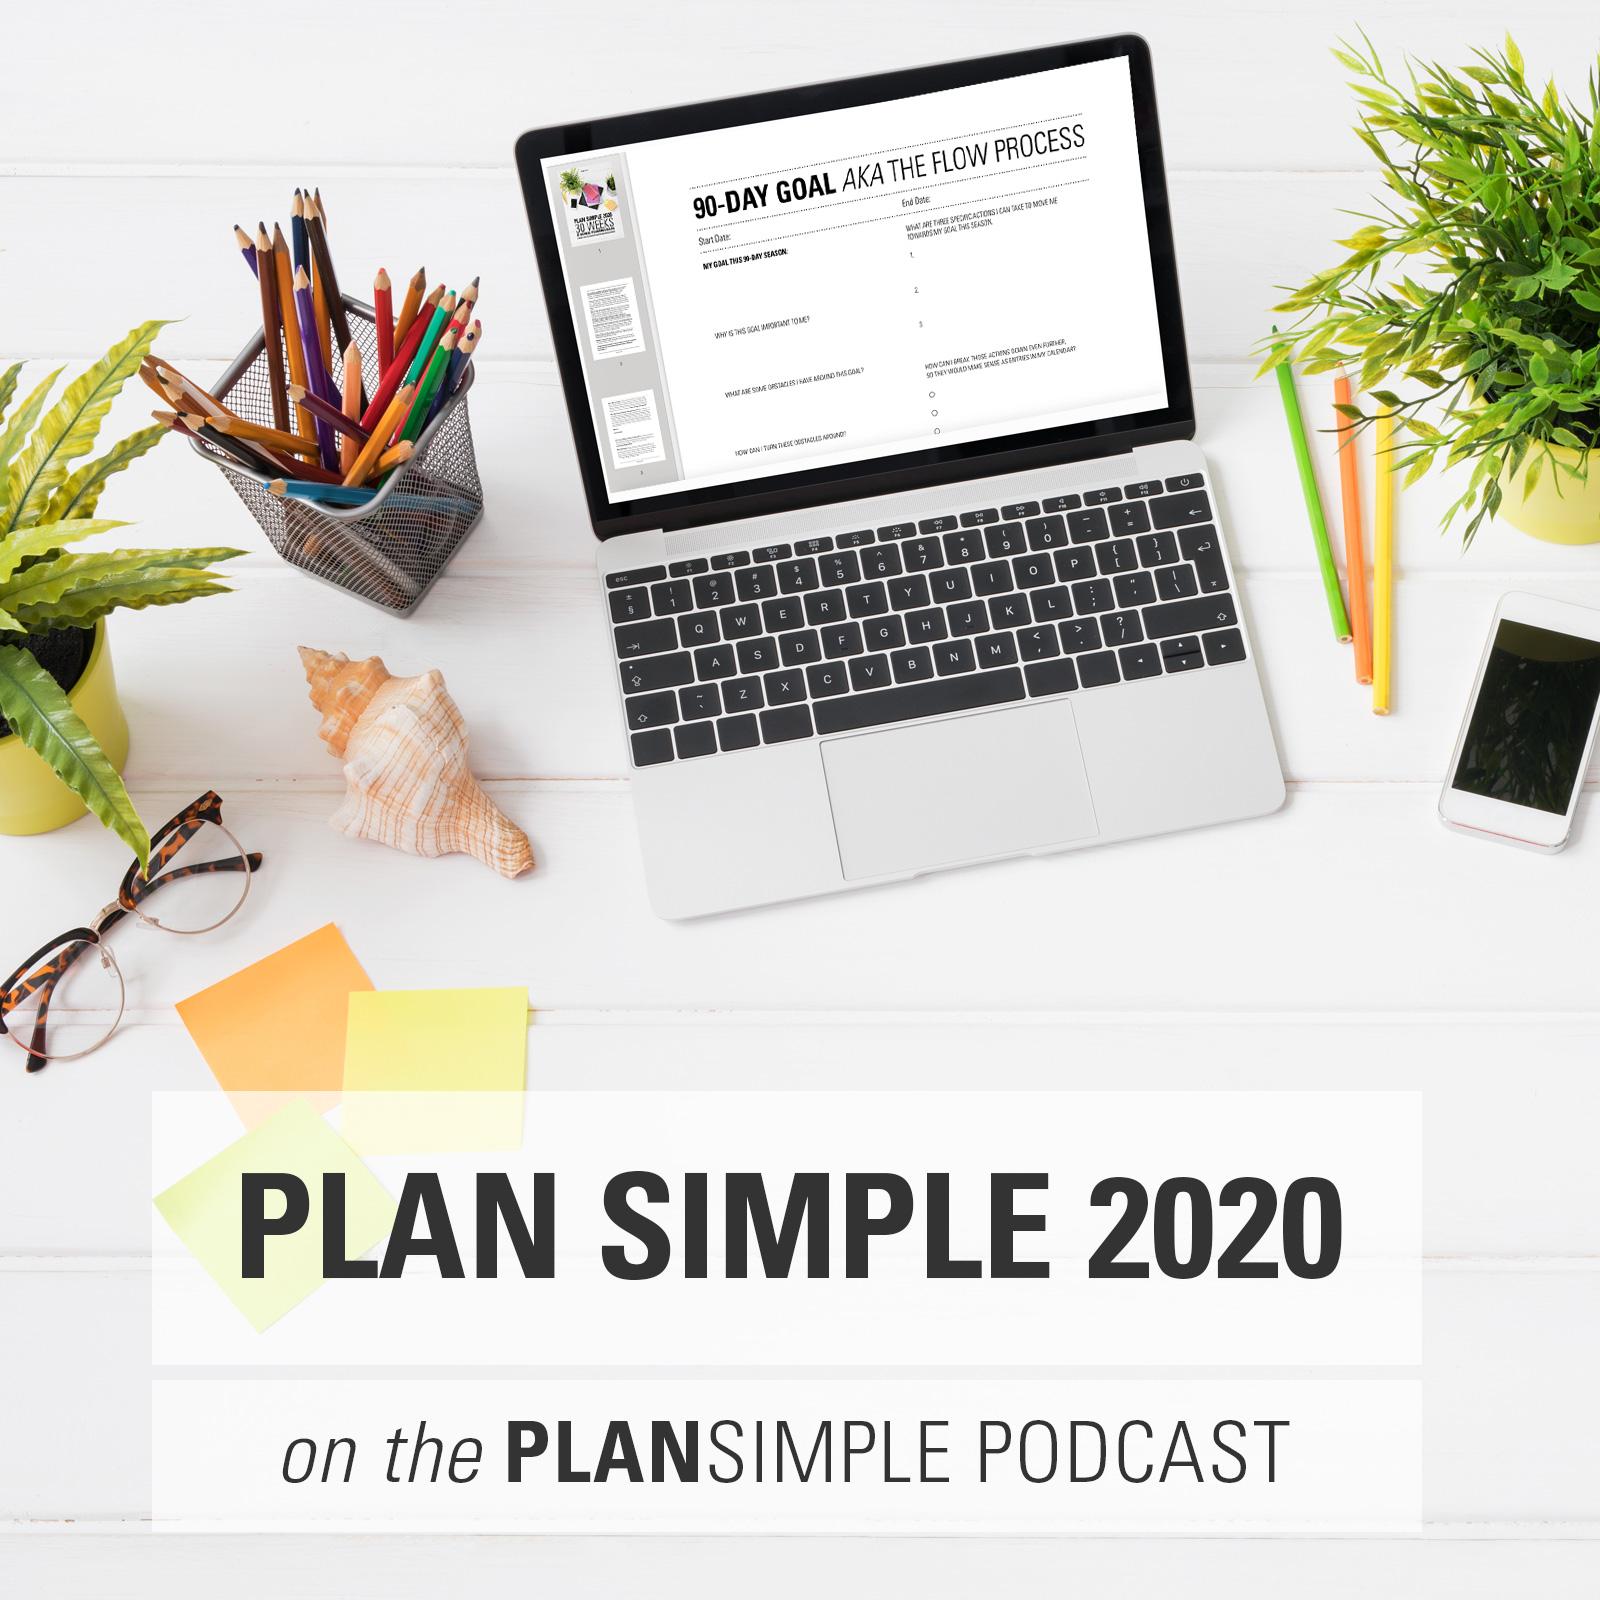 Plan Simple 2020